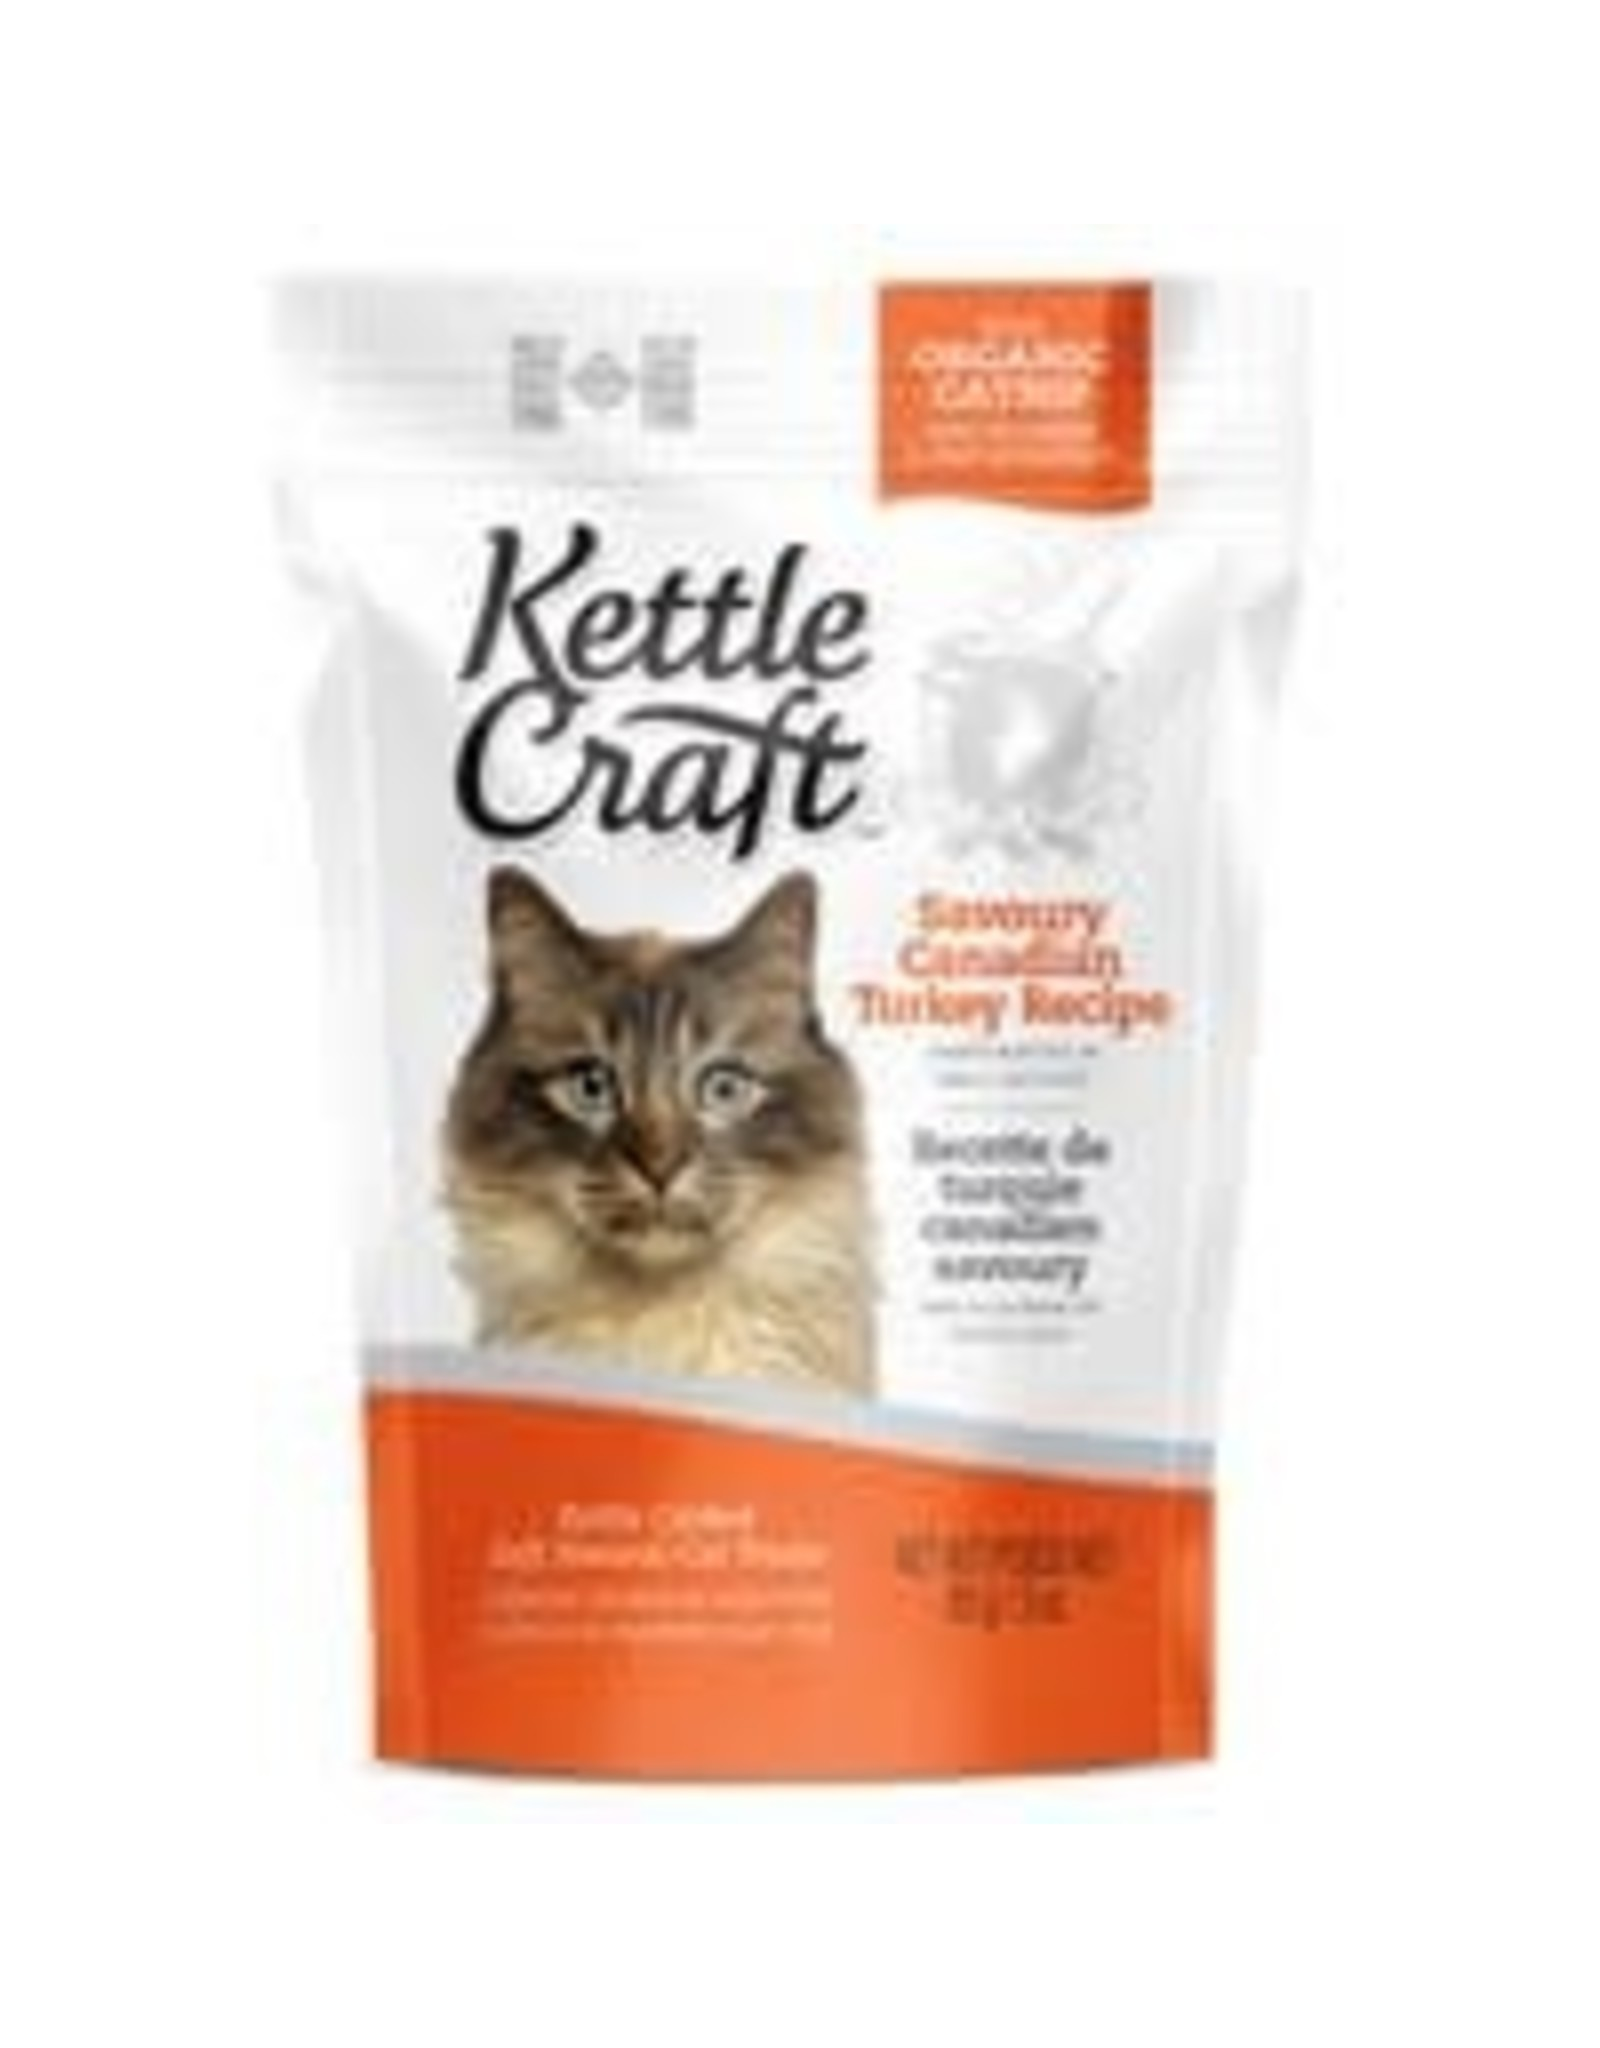 Kettle Craft K.C. Cat - Savoury Canadian Turkey 85g